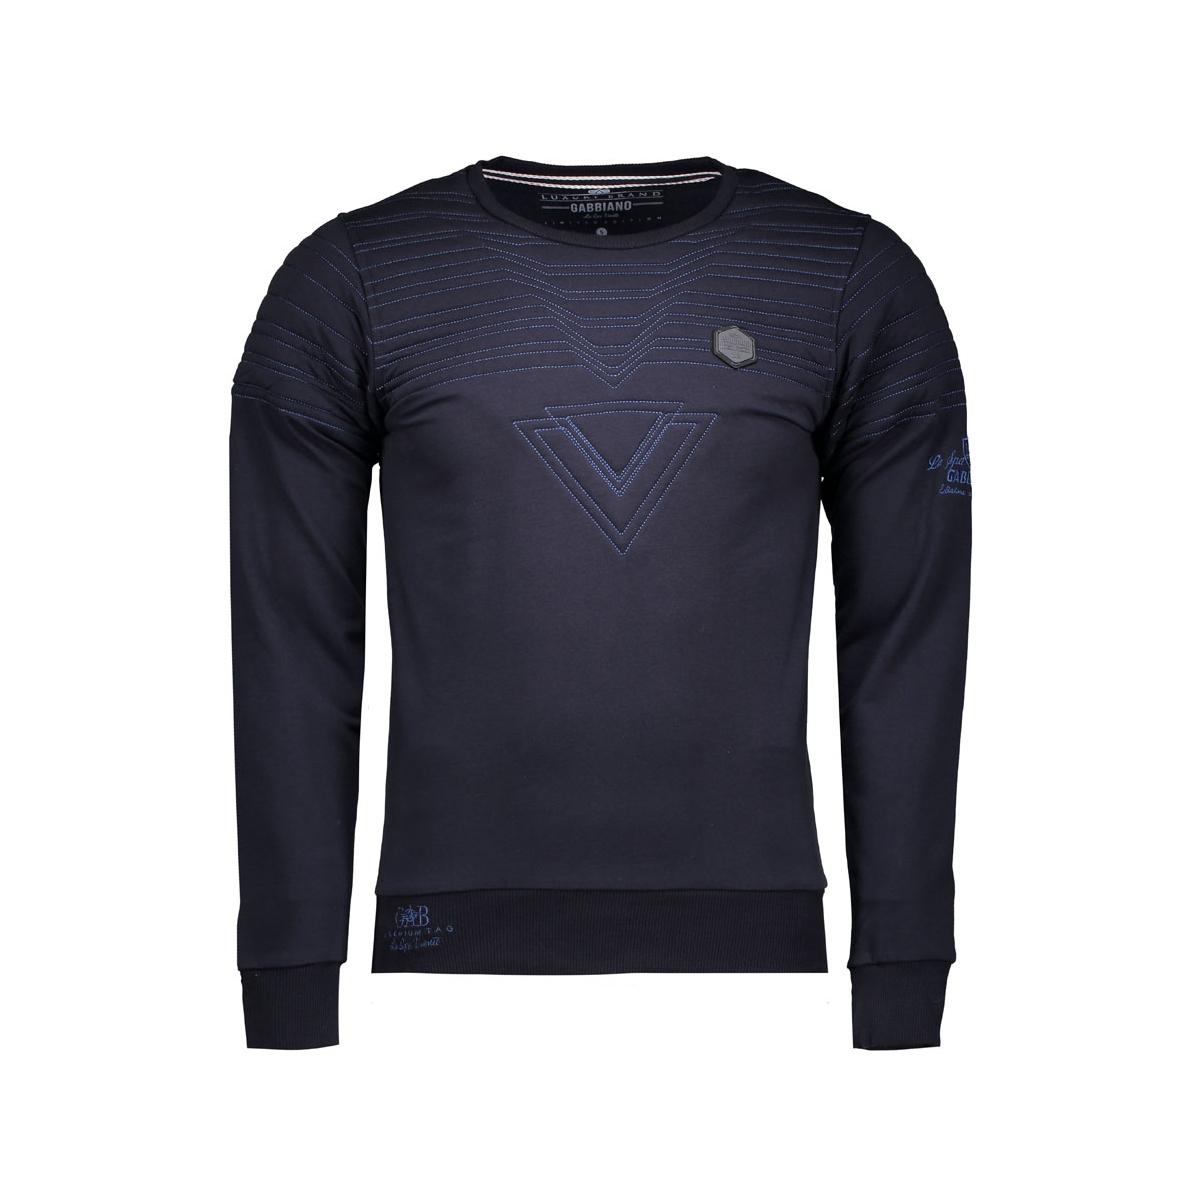 5447 gabbiano sweater navy